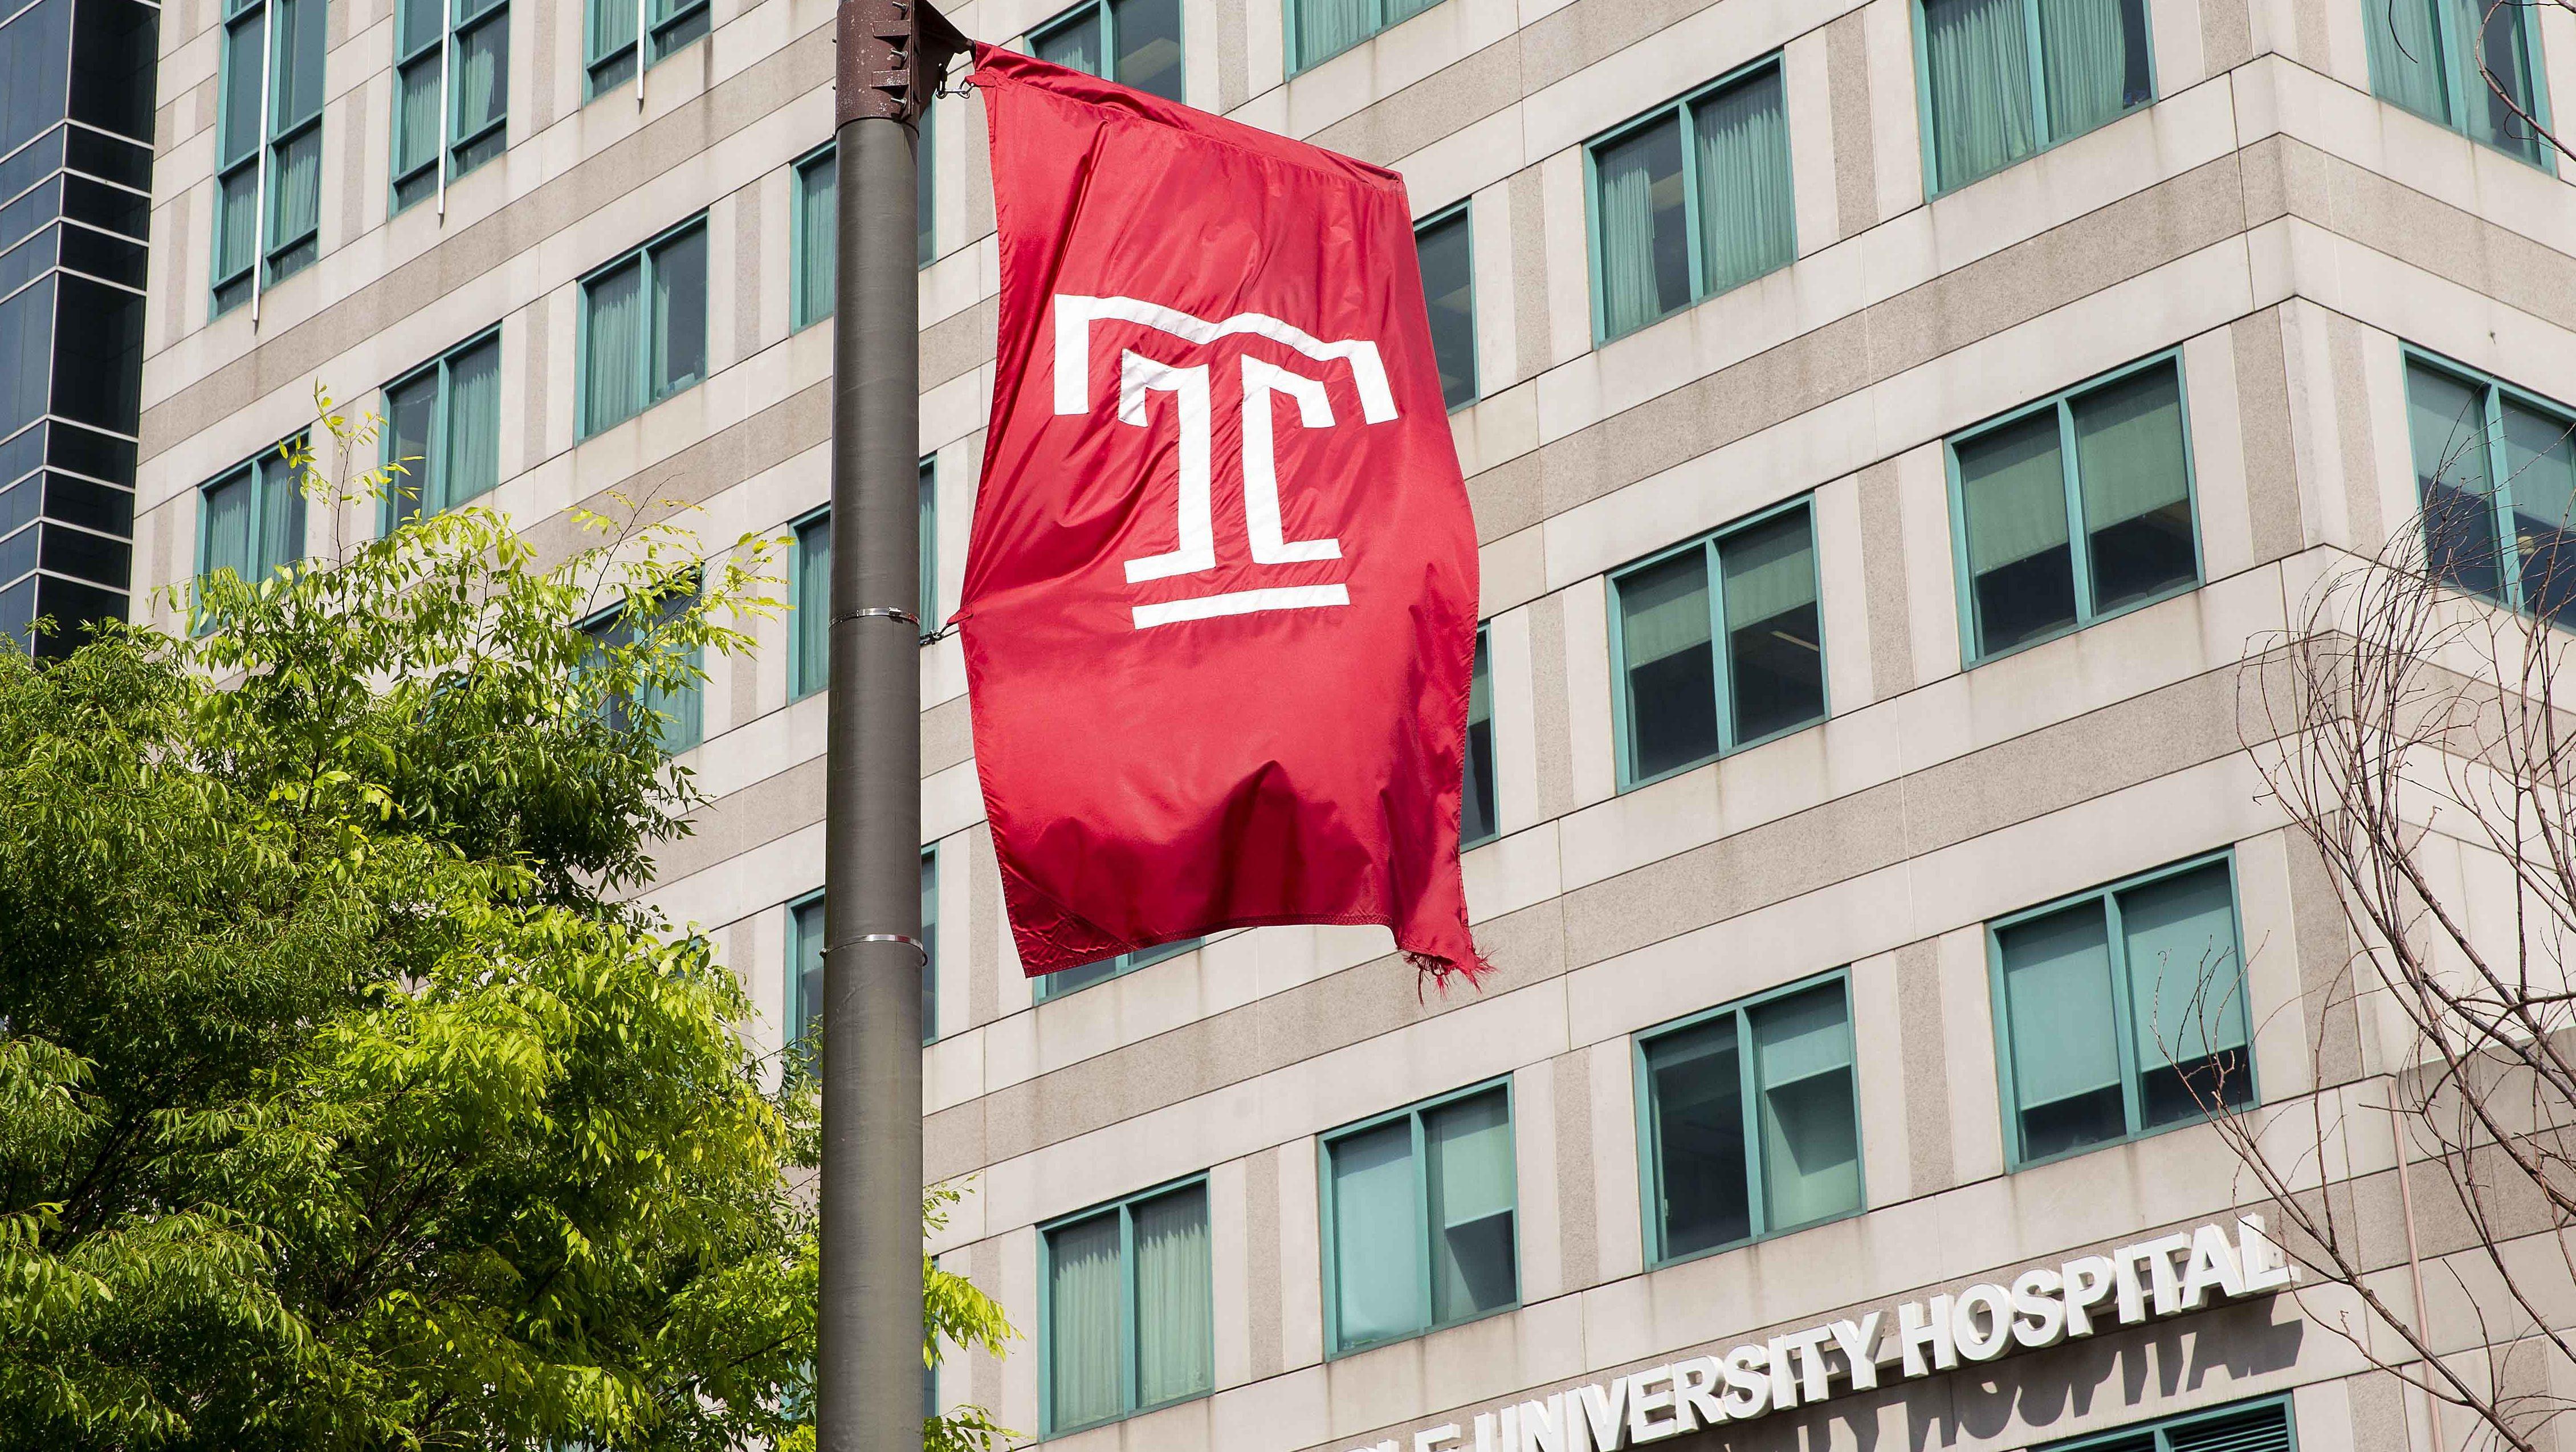 Temple University Hospital